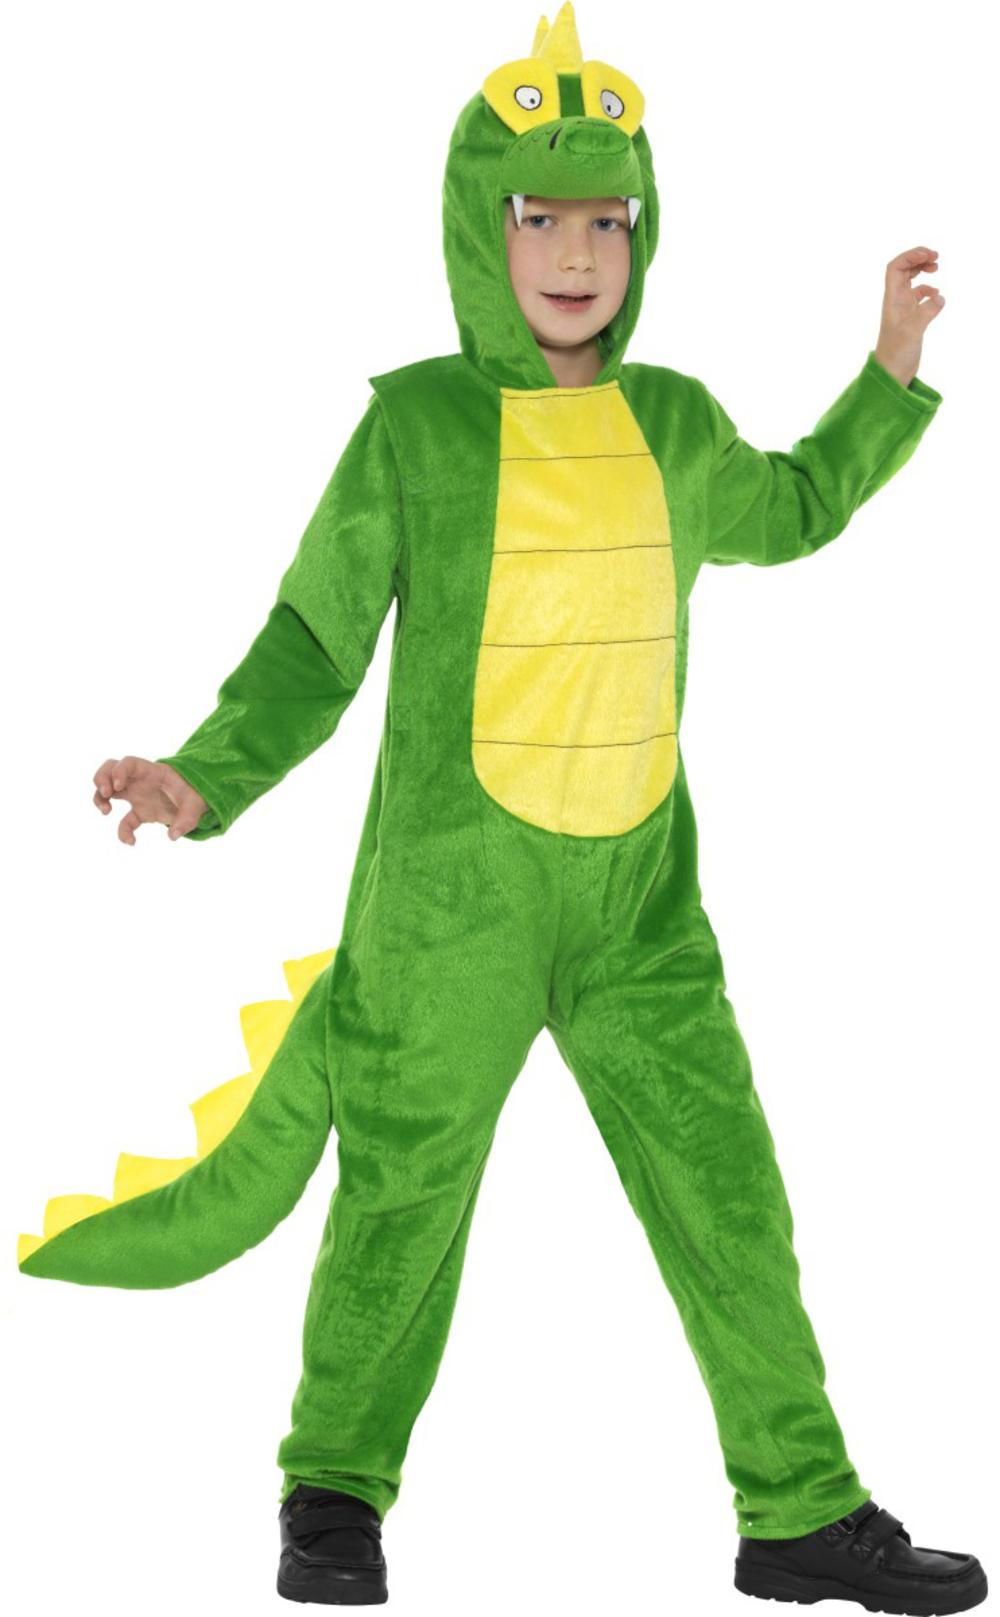 Crocodile Kids Fancy Dress Alligator Animal Roald Dahl Book Day Childs Costume